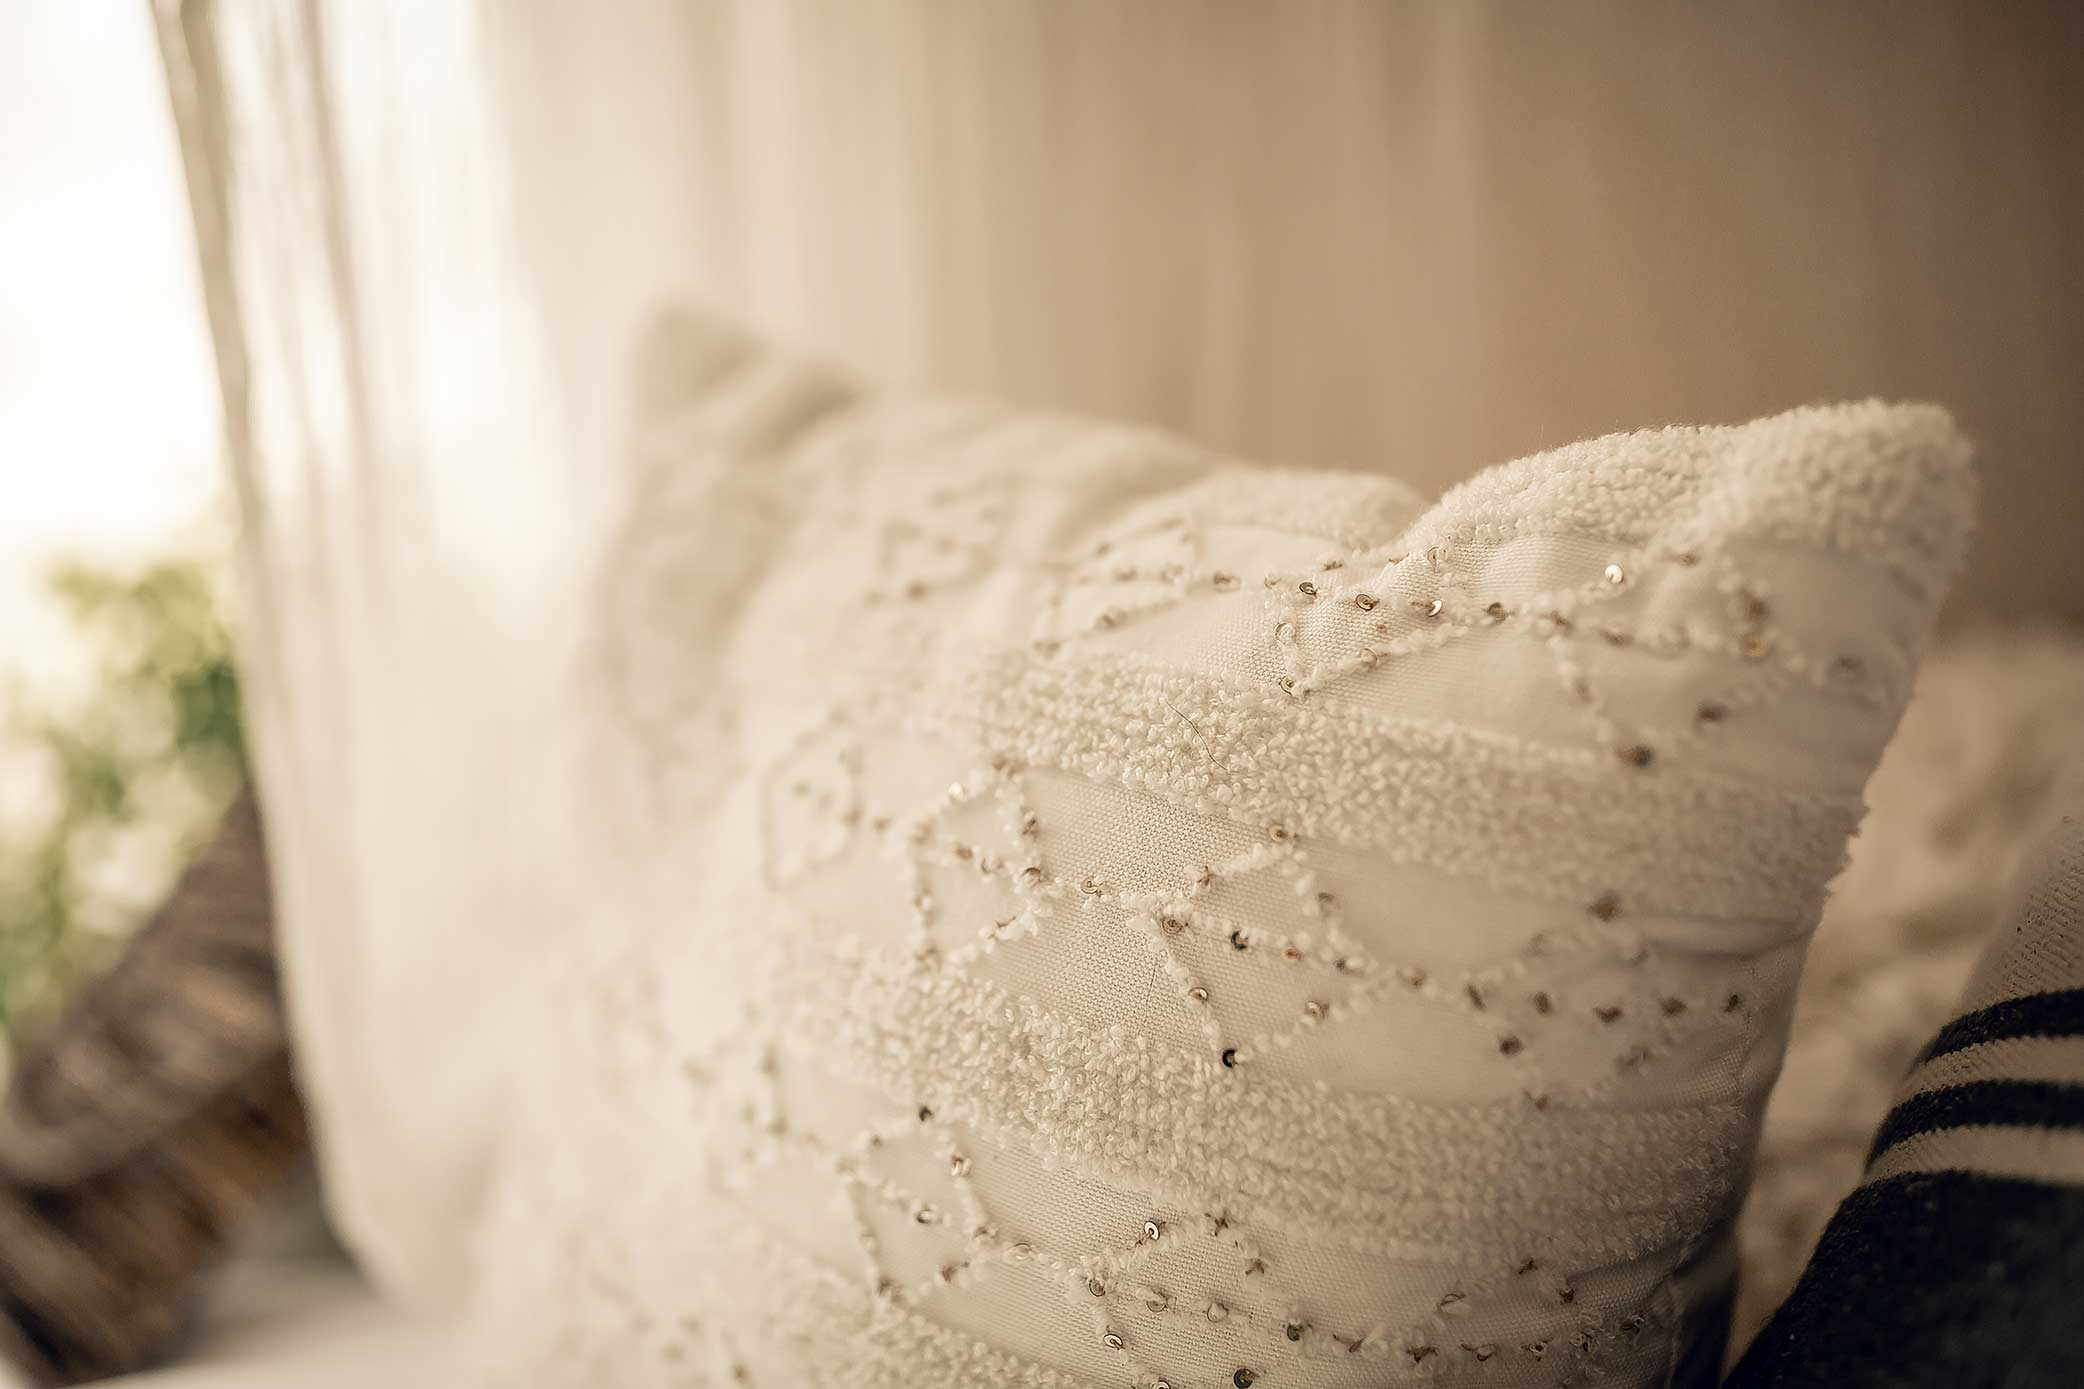 shelby-schiller-photography-lifestyle-studio-geometric-boho-pillow.jpg